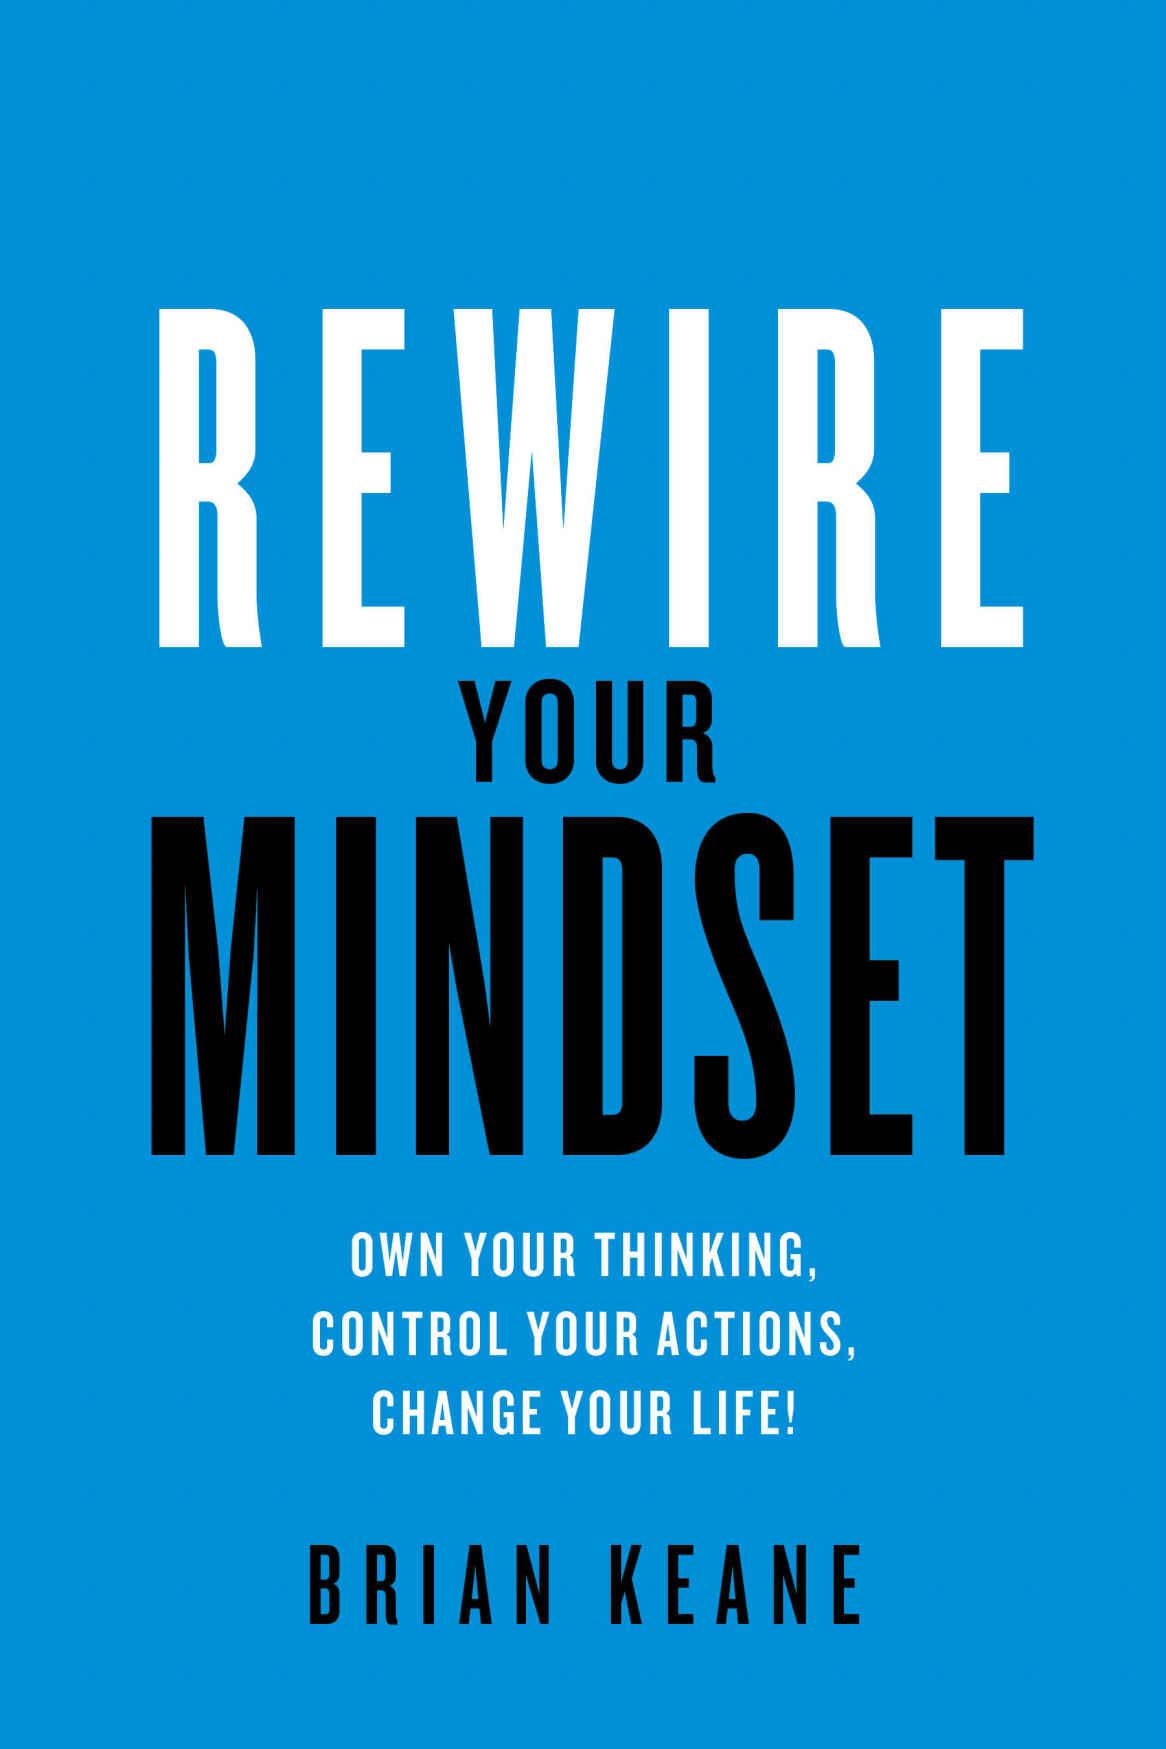 Rewire your mindset - Brian Keane kindle edition 99p Amazon